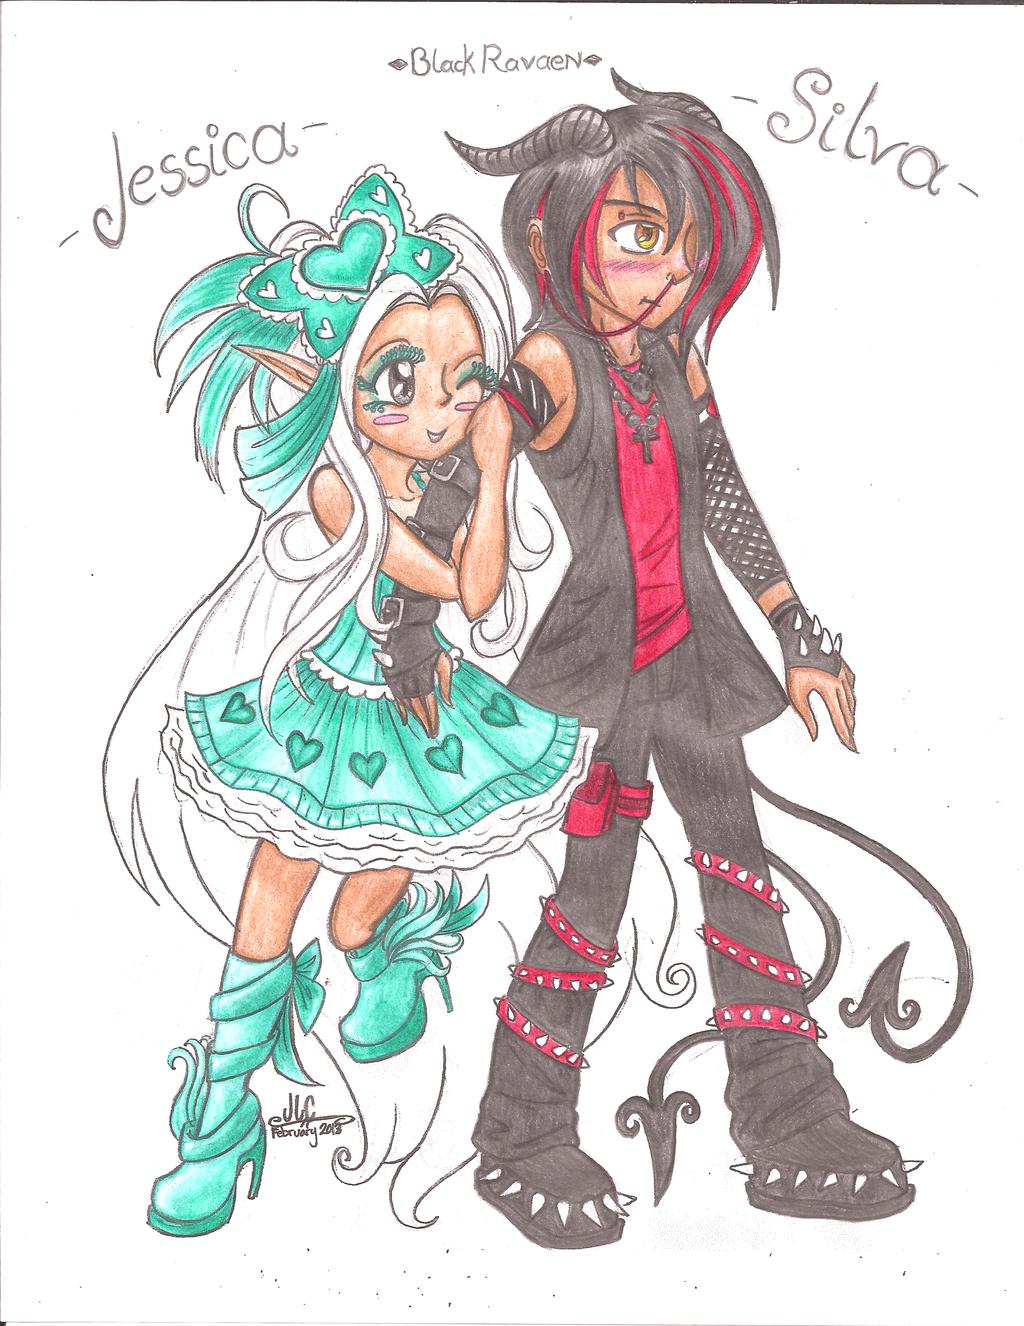 Black Ravaen's Request - Jessica and Silva by HirokoTheHedgehog